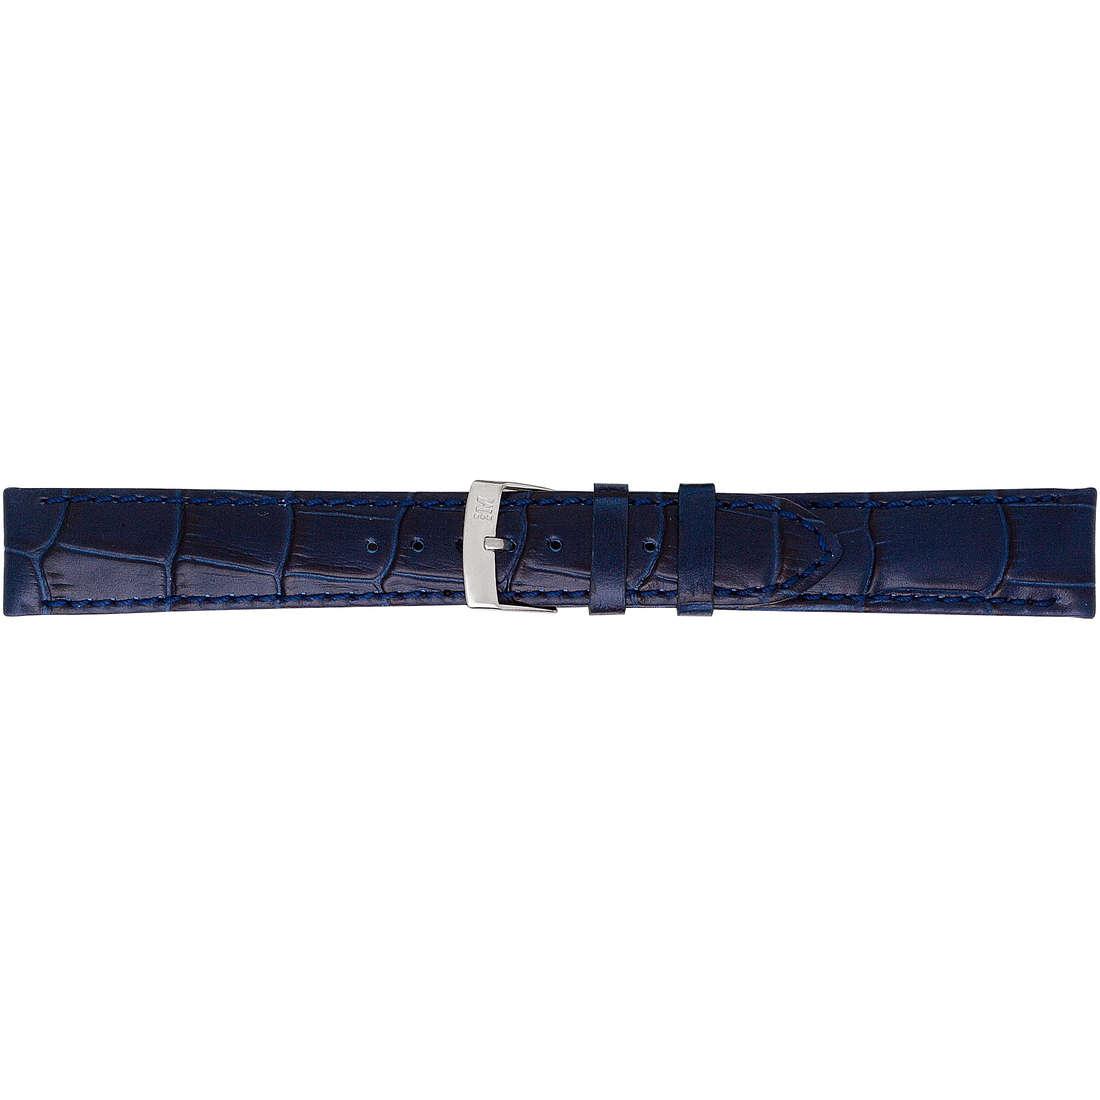 montre bande de montres homme Morellato Performance A01X2704656062CR14